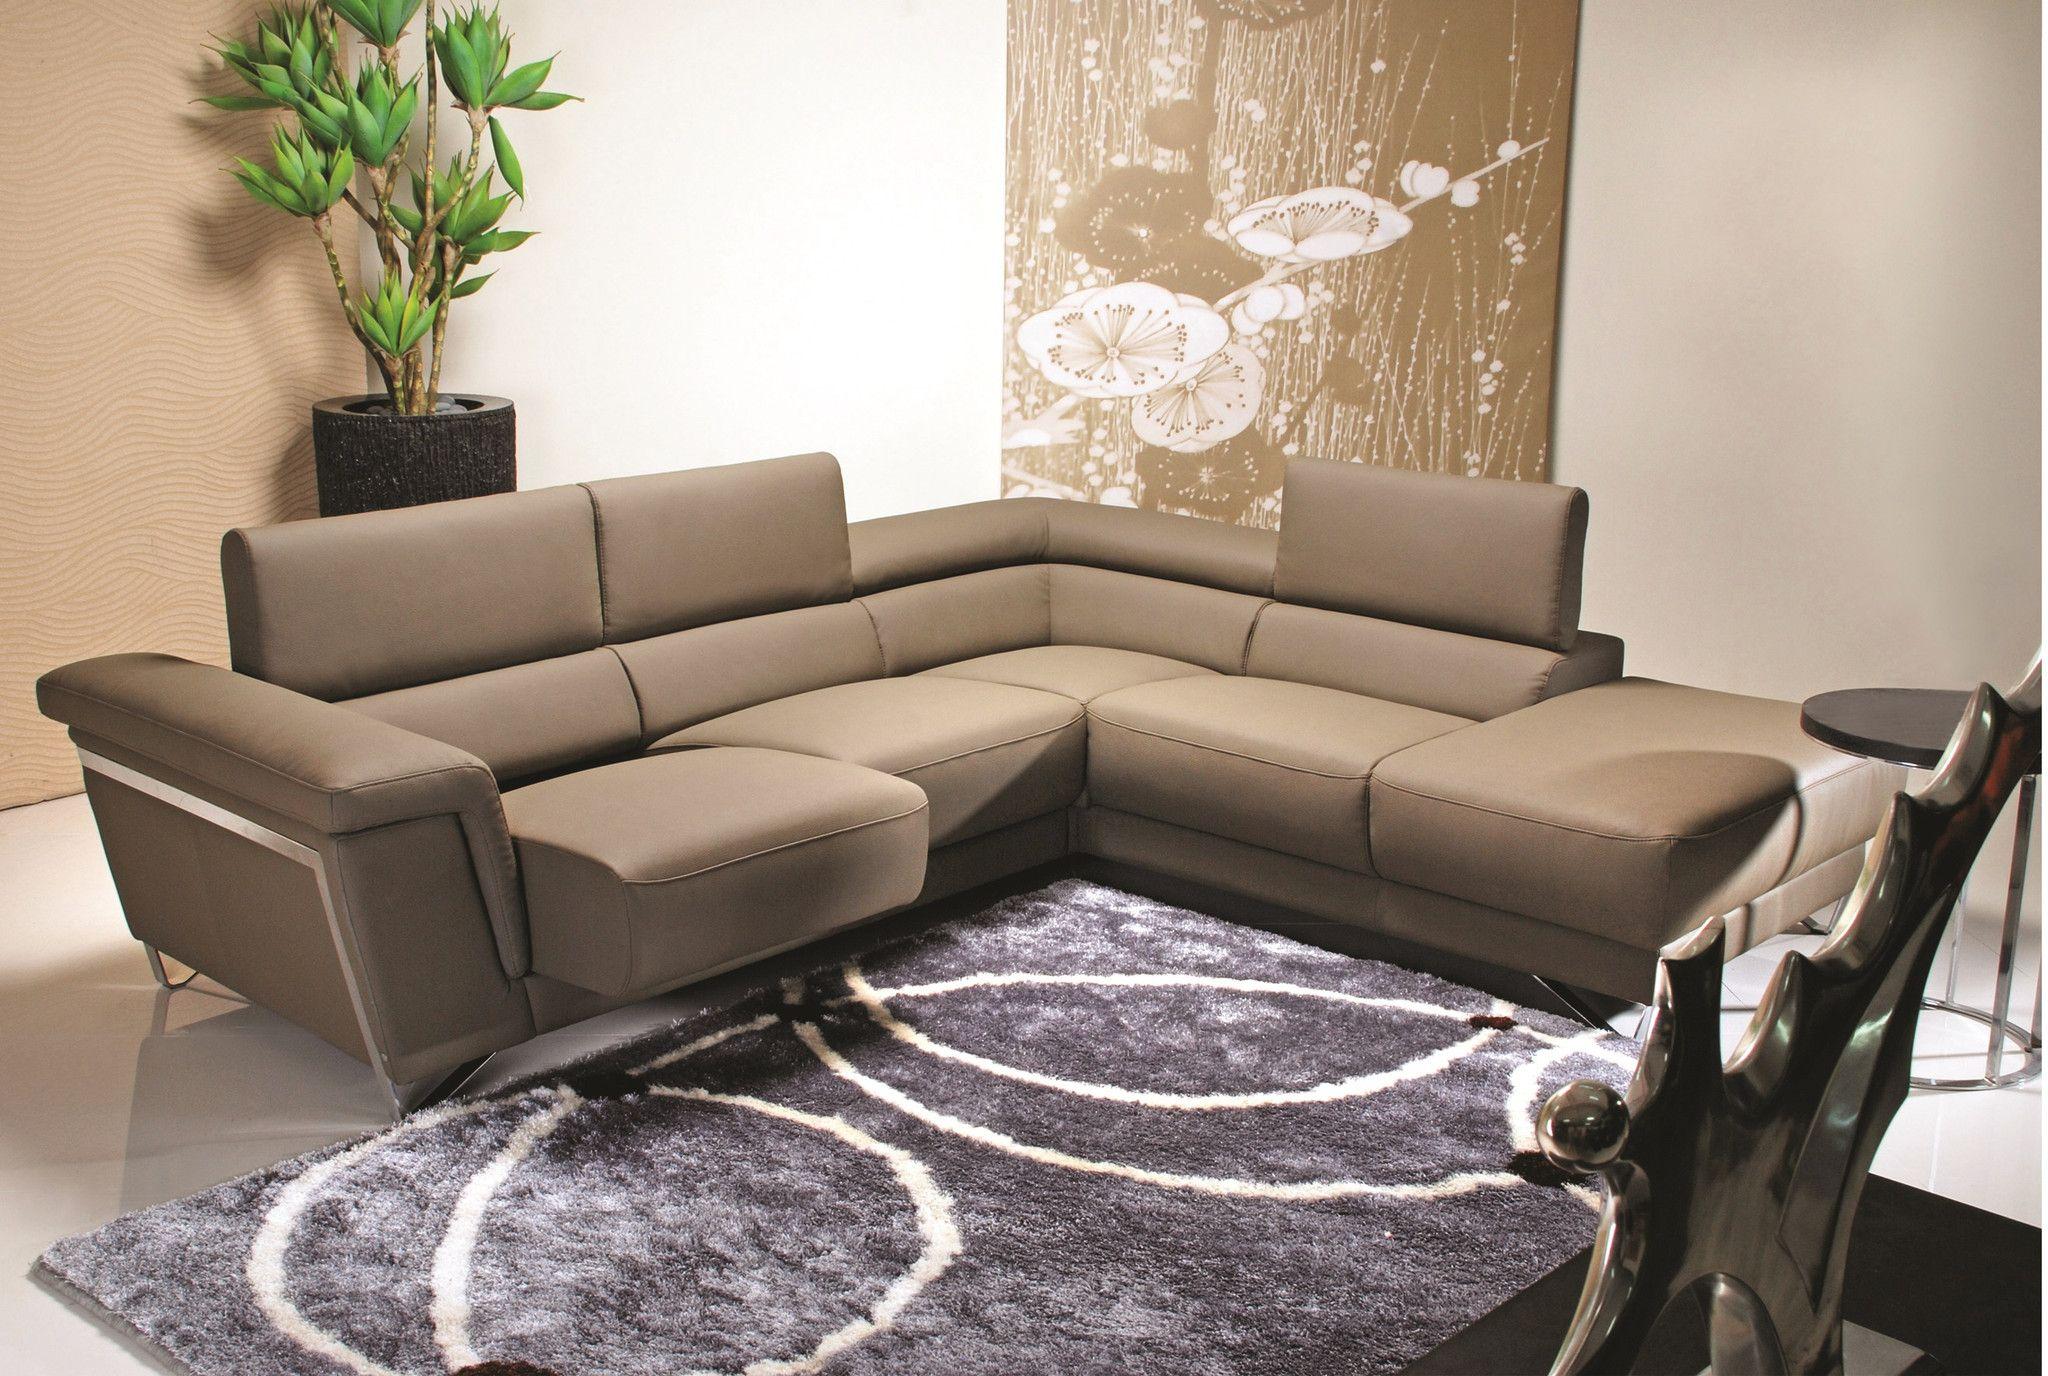 GTU Furniture Contemporary Bonded Leather Sofa Loveseat Set 2